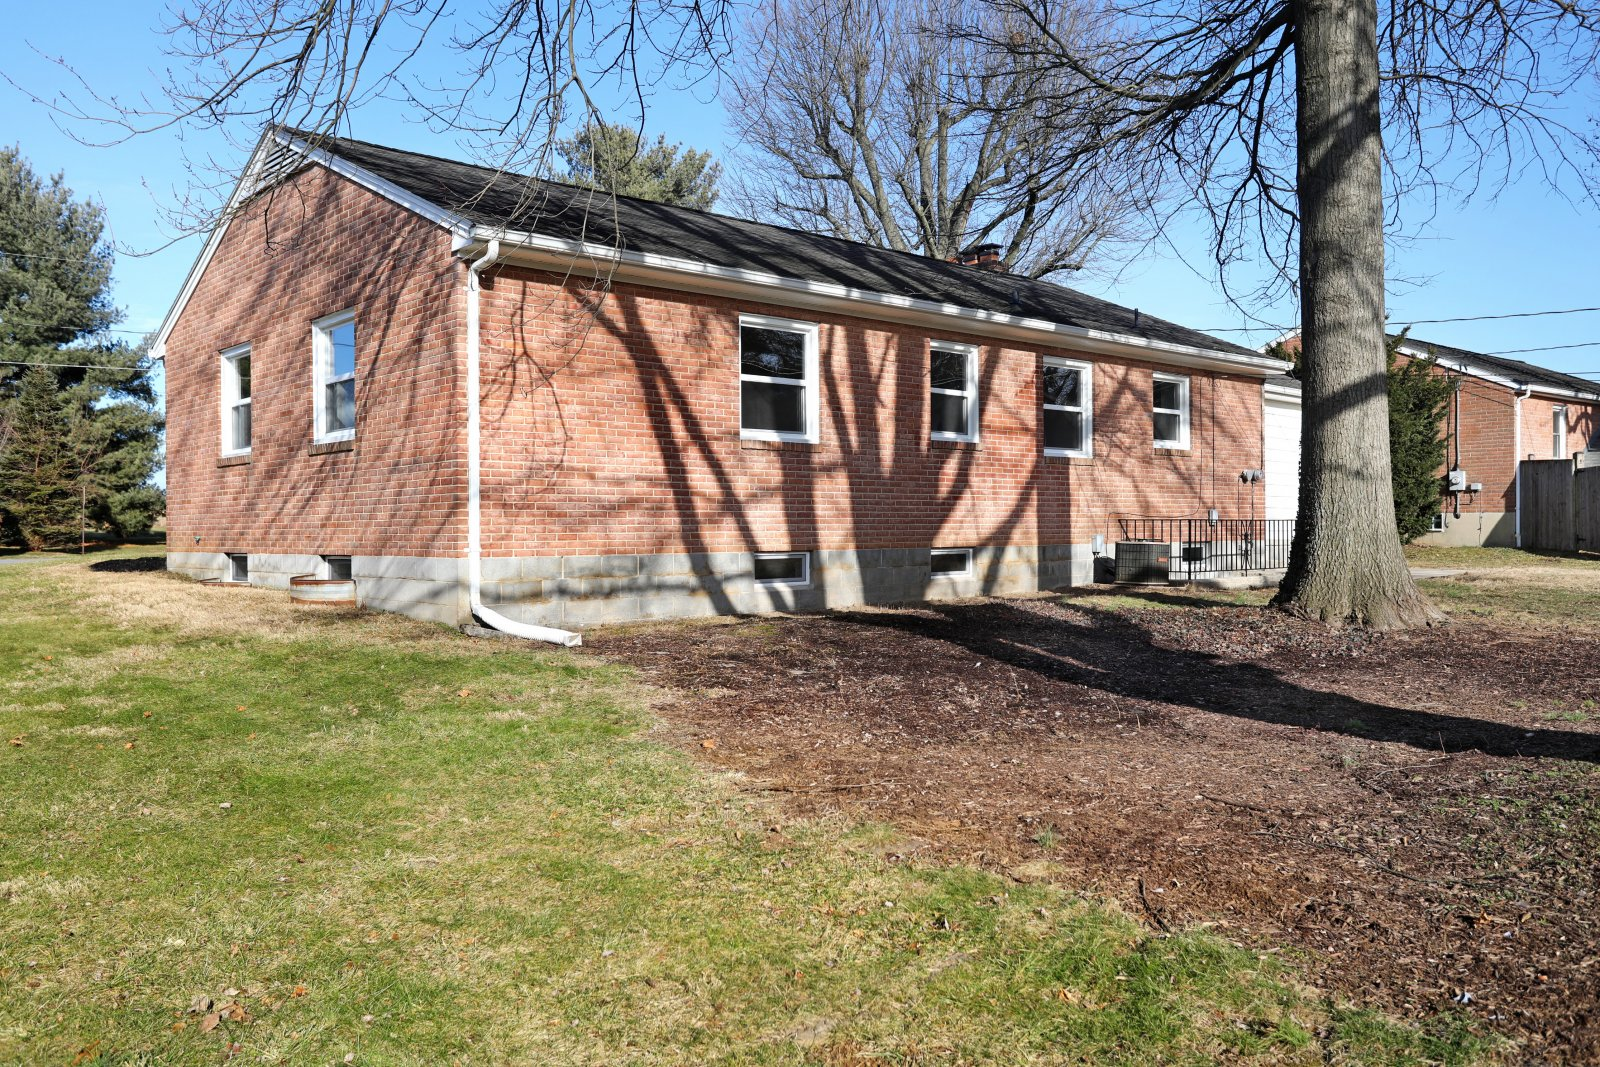 17917 Oak Ridge Drive, Hagerstown, MD, USA- Bill Kenny_Ed 17917 Oak Ridge Drive, Hagerstown MD 21740